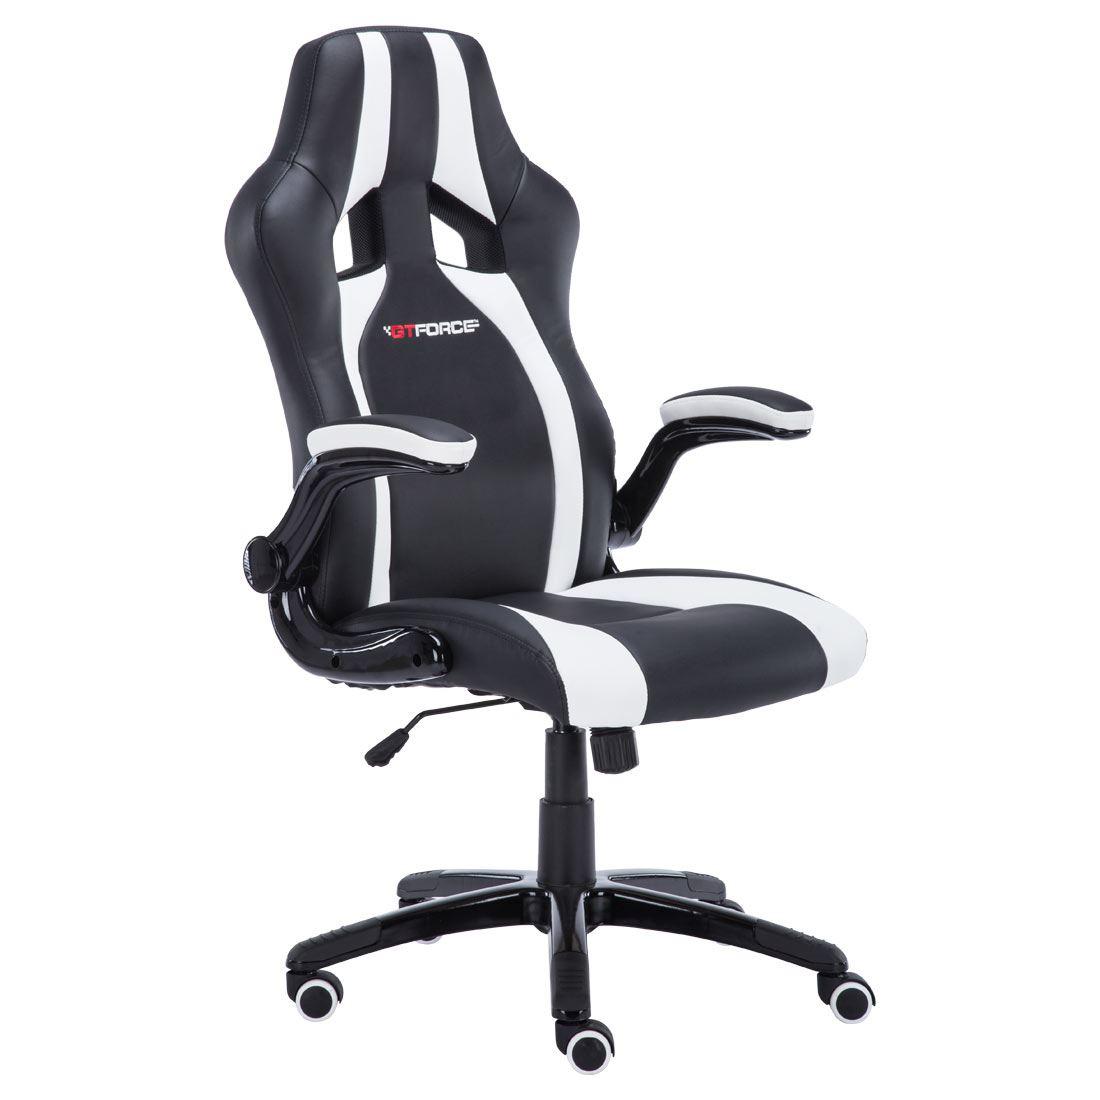 white ergonomic office chair uk bedroom gumtree london gtforce roadster 2 black sport racing car